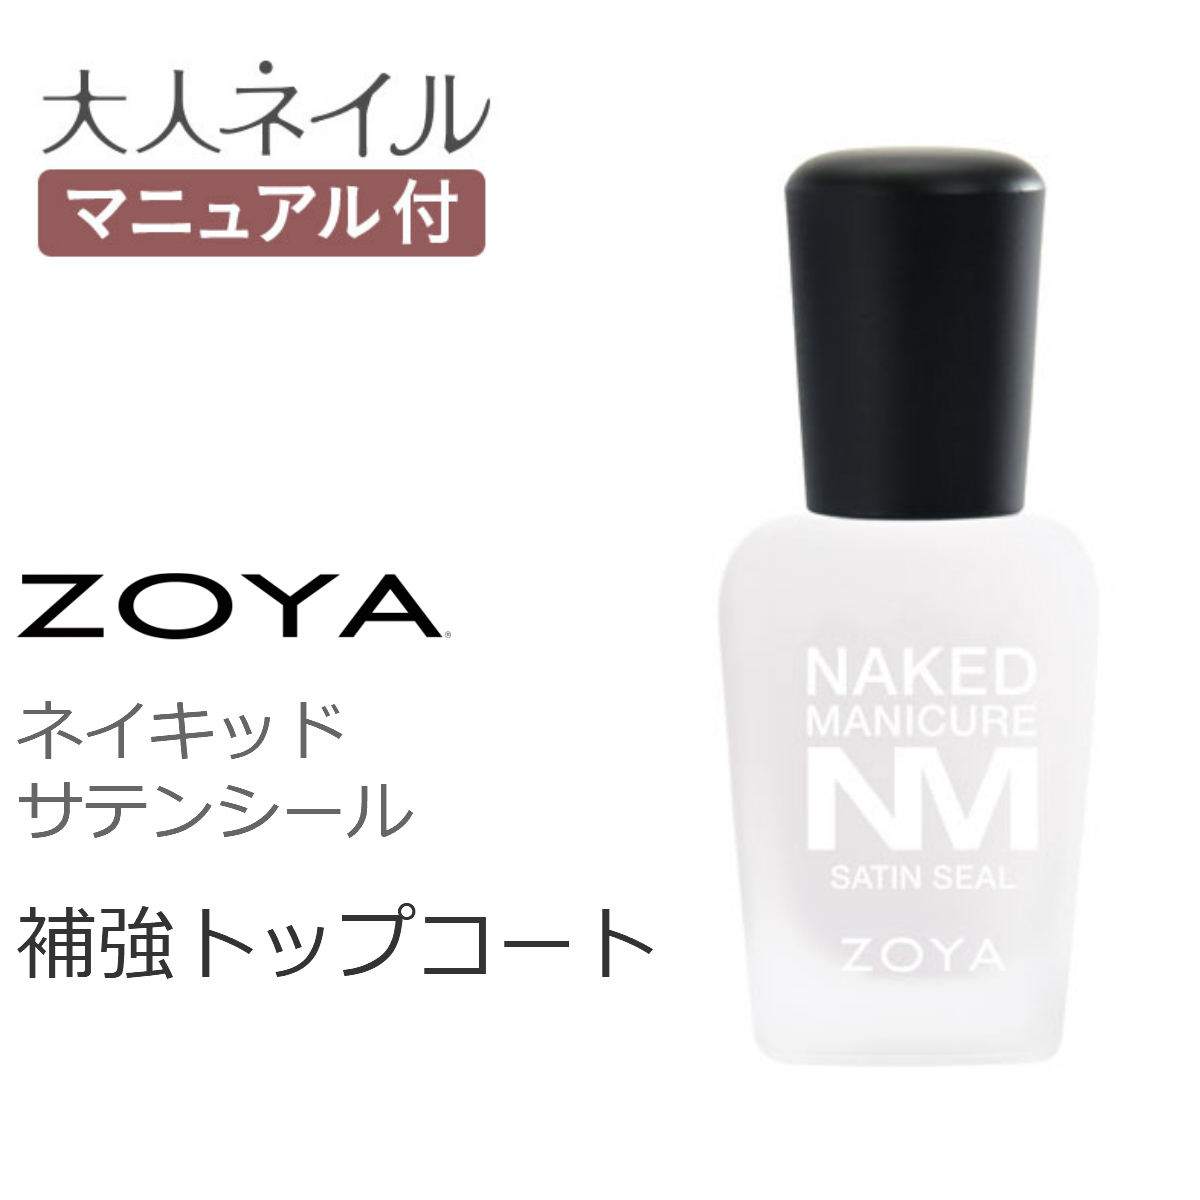 ZOYA ゾーヤ ネイキッドマニキュア サテンシール 15ml トップコート 補強 厚み 滑らか ややマット 自然 自爪に近い